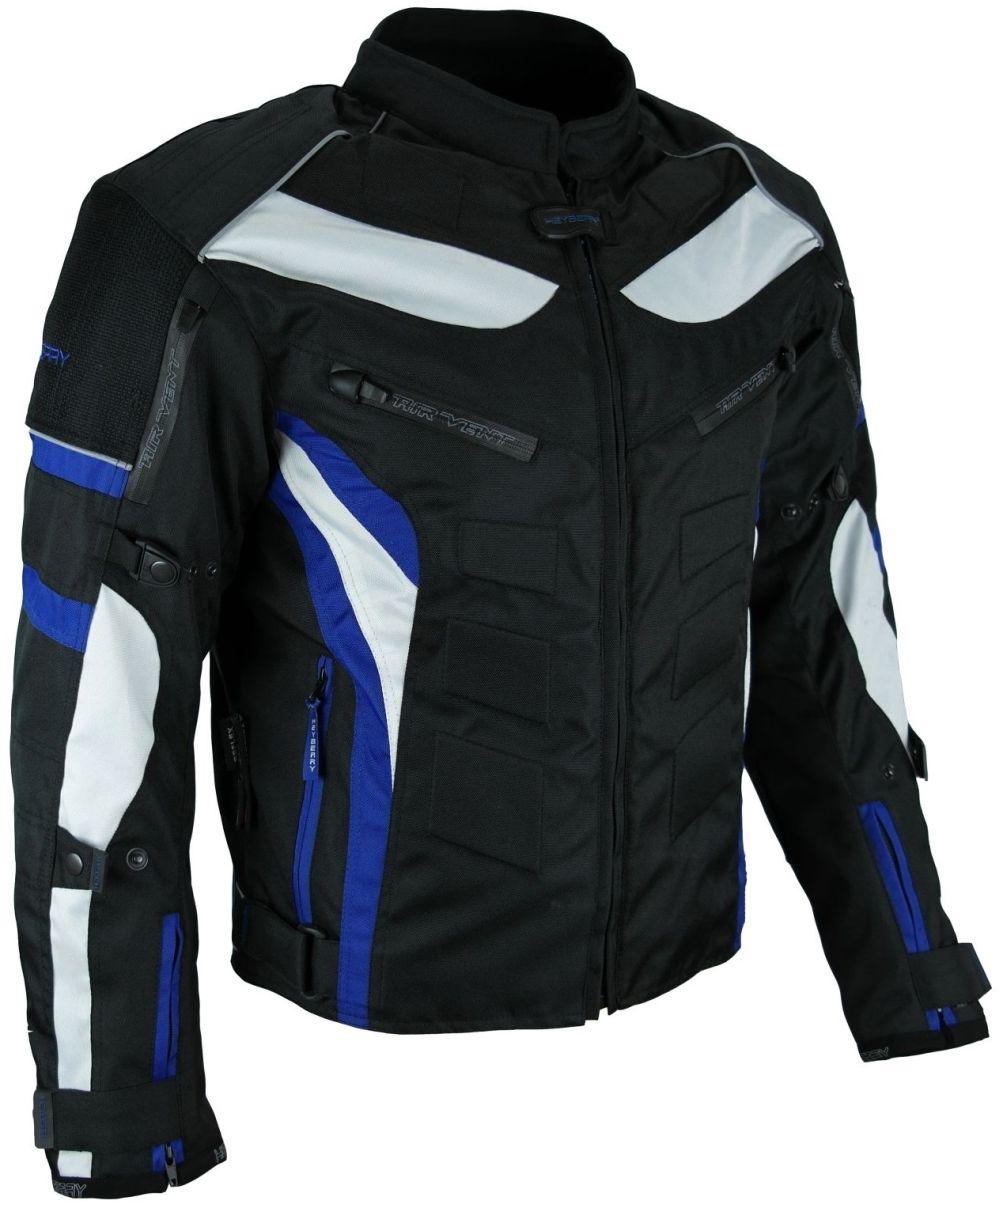 streetfun textil motorrad jacke motorradjacke schwarz blau. Black Bedroom Furniture Sets. Home Design Ideas